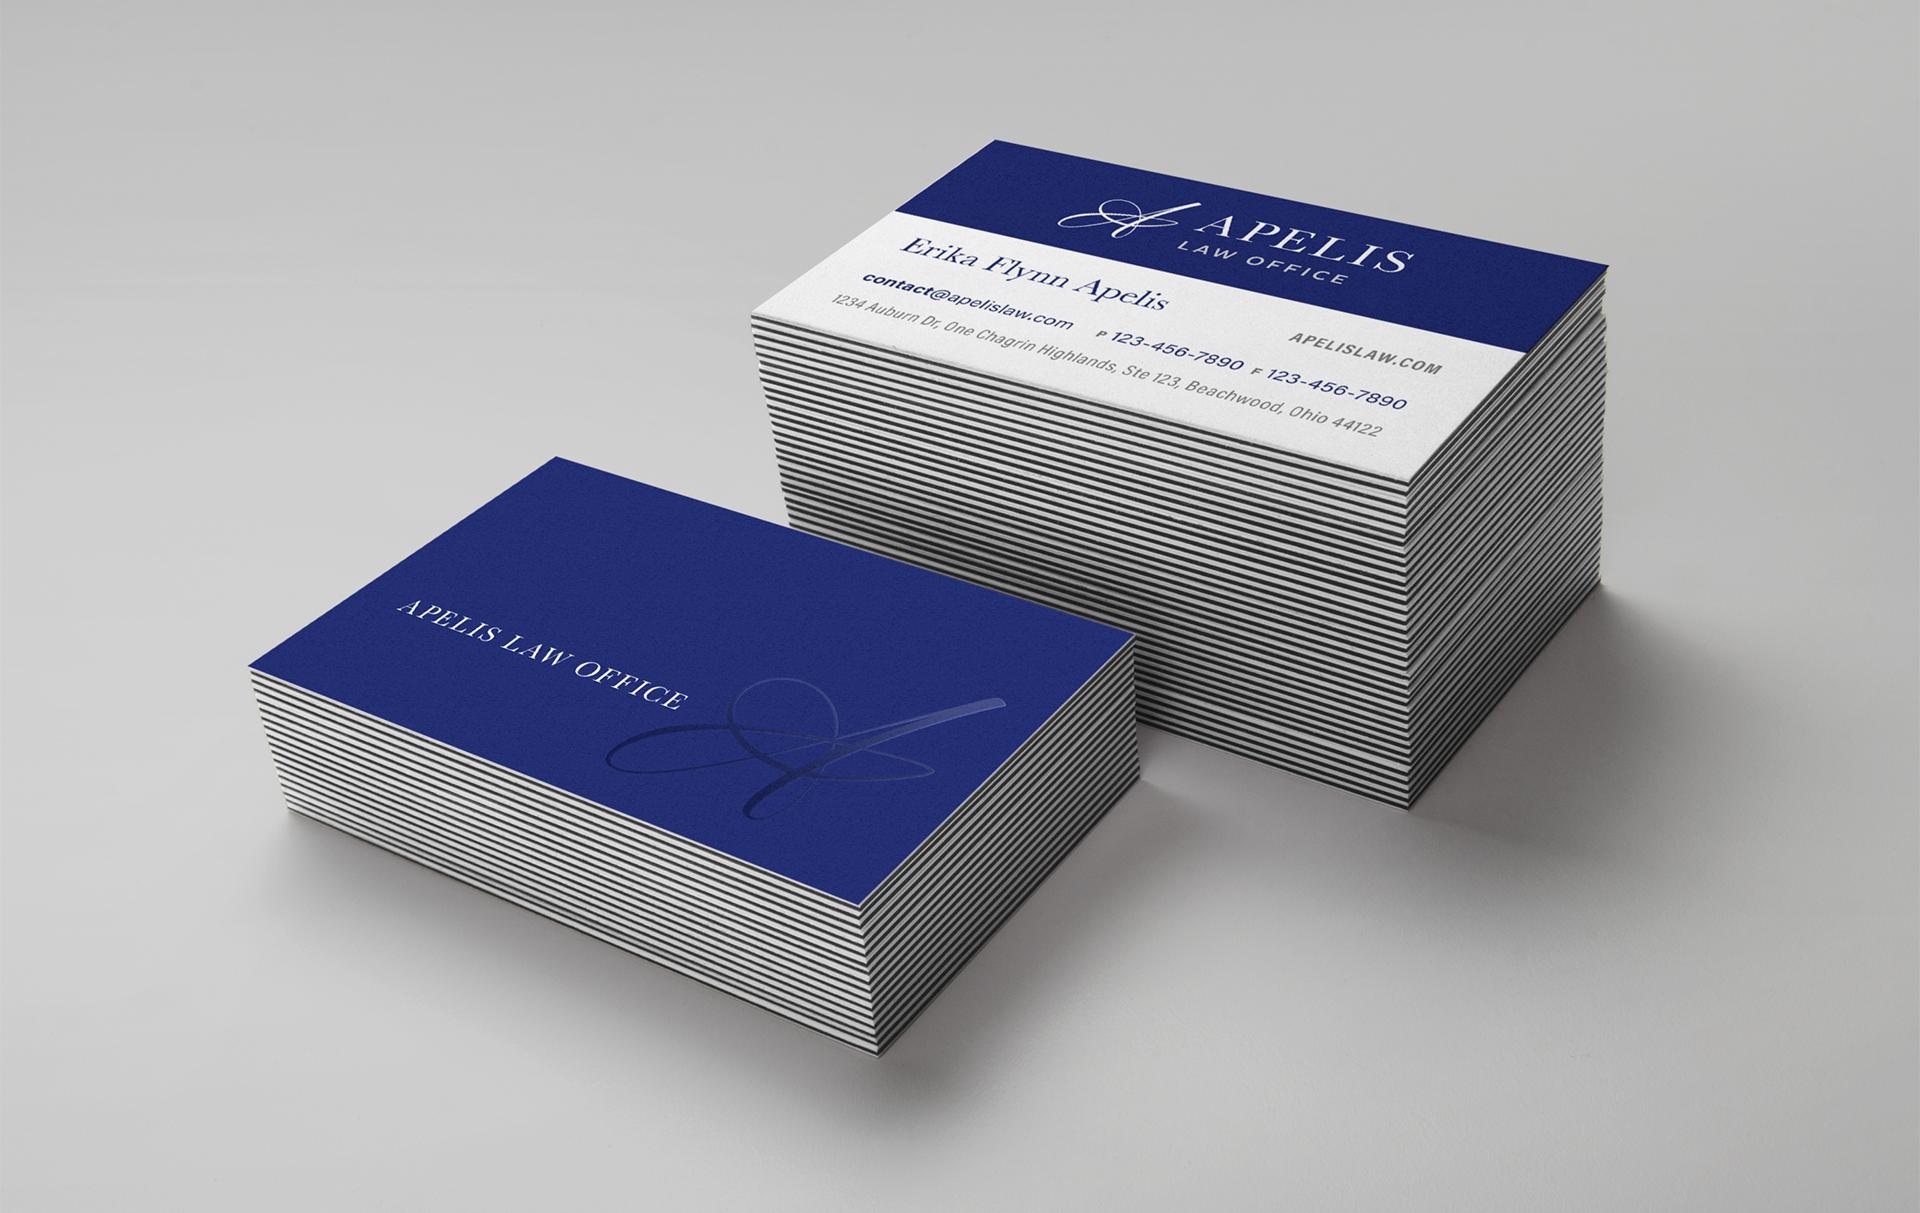 Apelis Law Office business card design